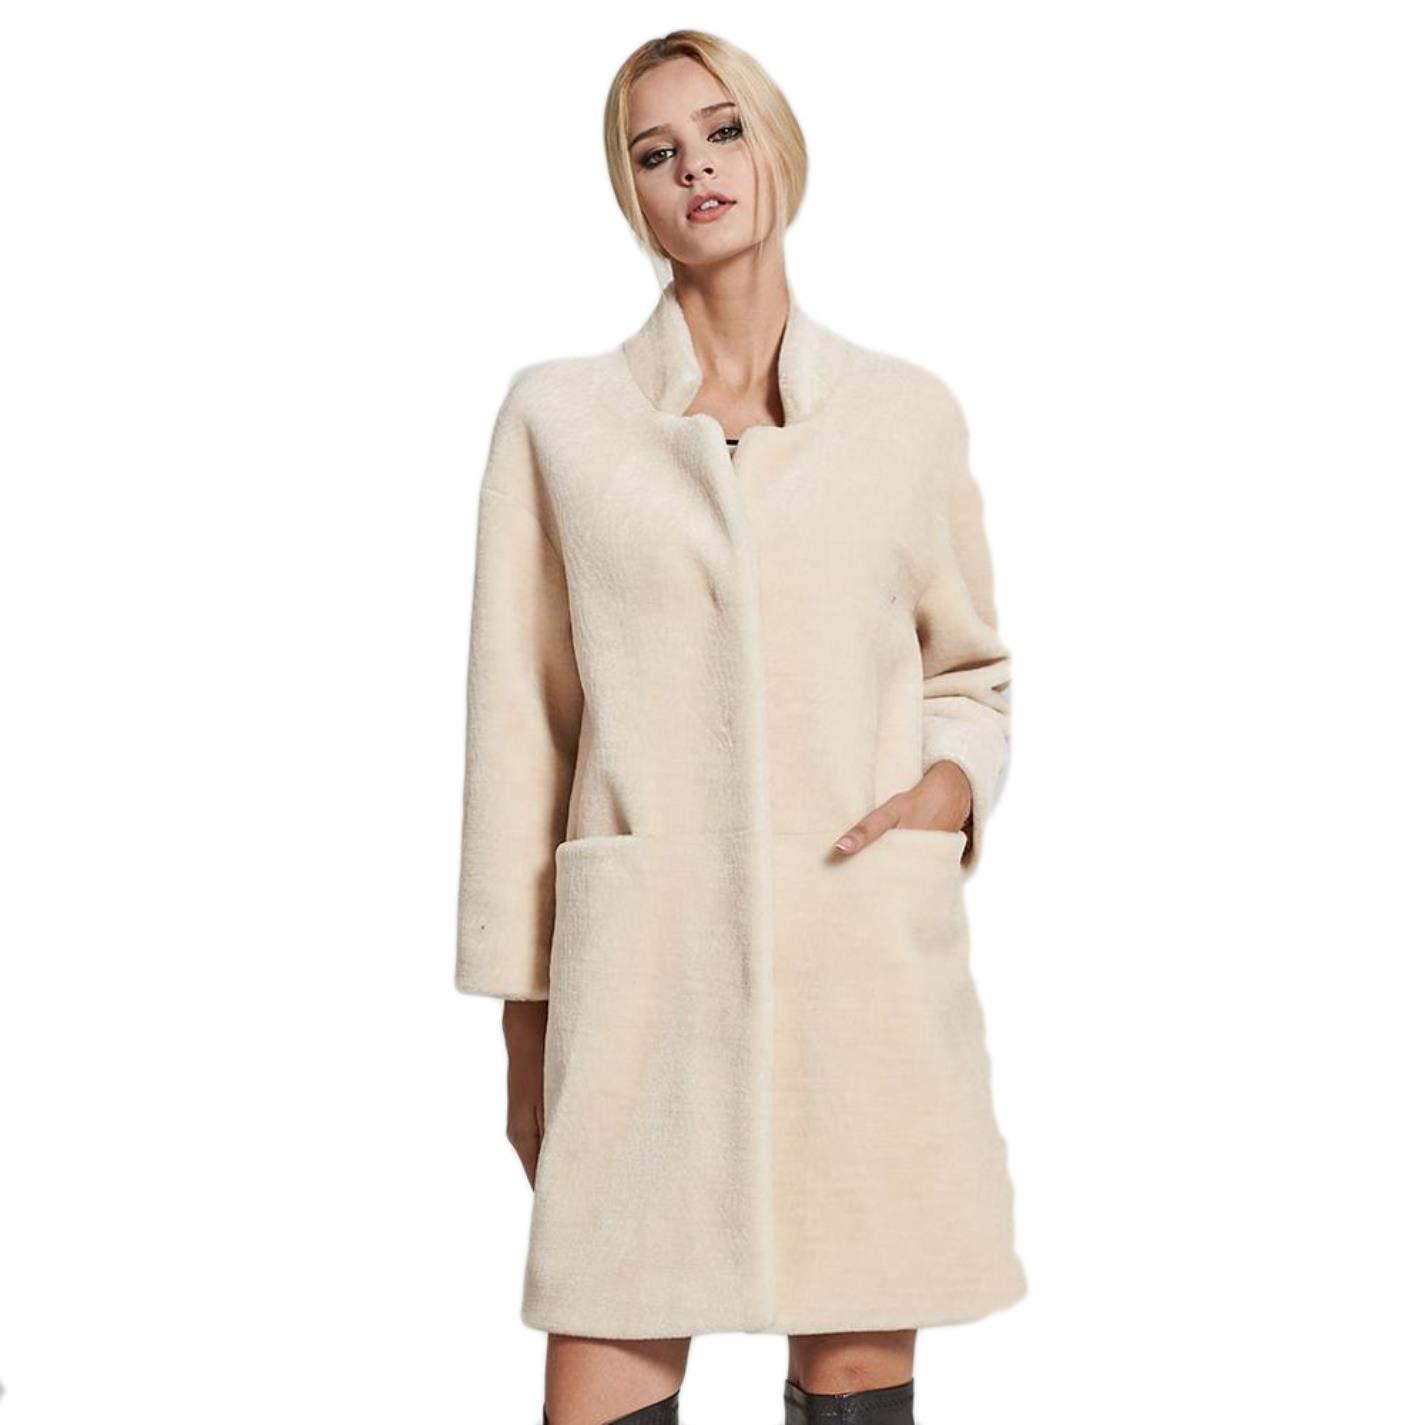 Beige Baeuty Women's Leather Coat Collar Collar Velvet Jacket Sheepskin Coat